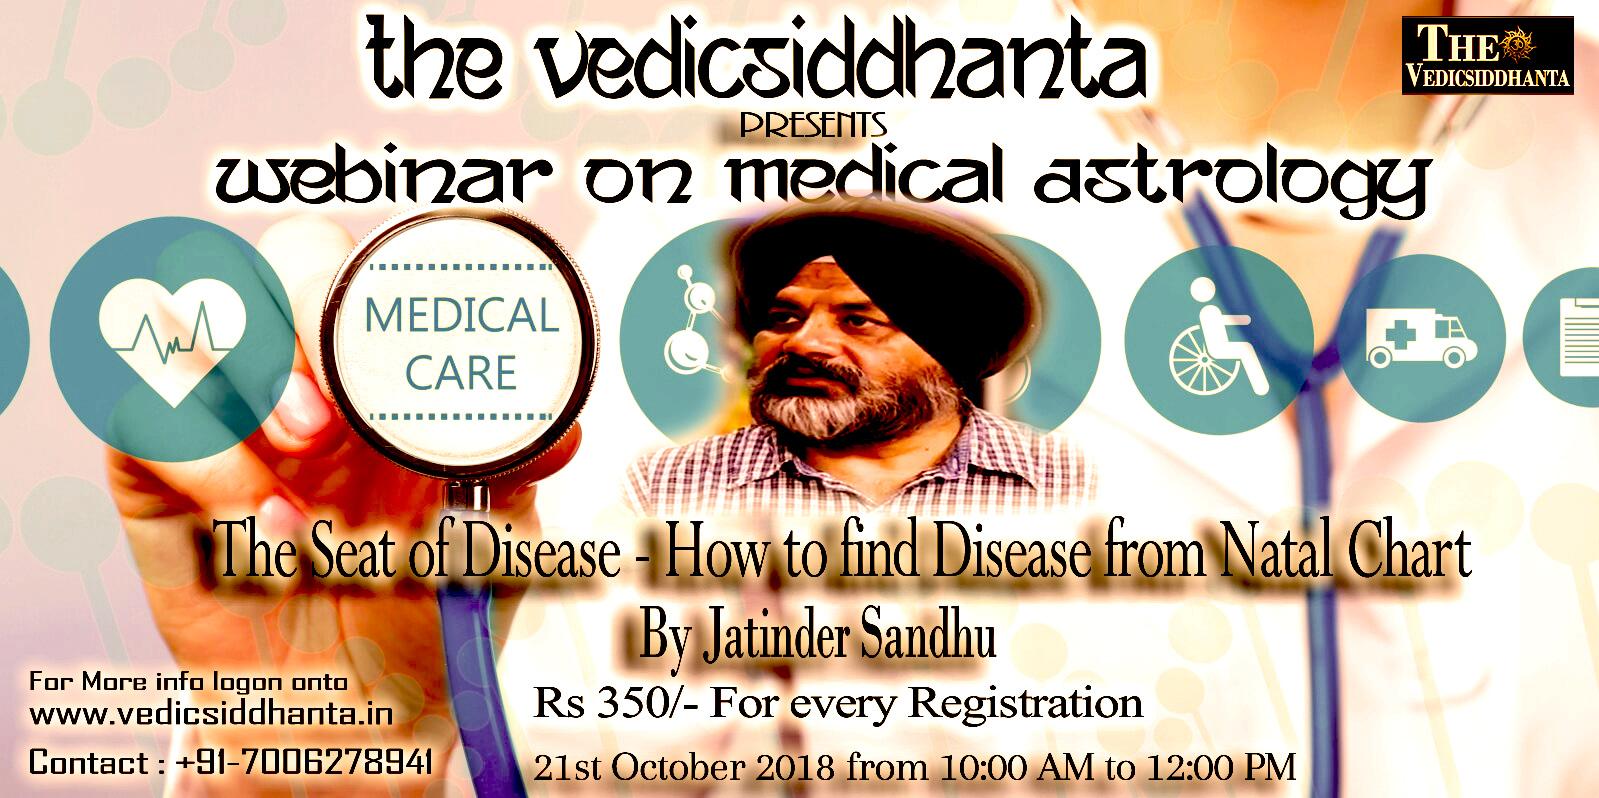 News Archives - The Vedic Siddhanta